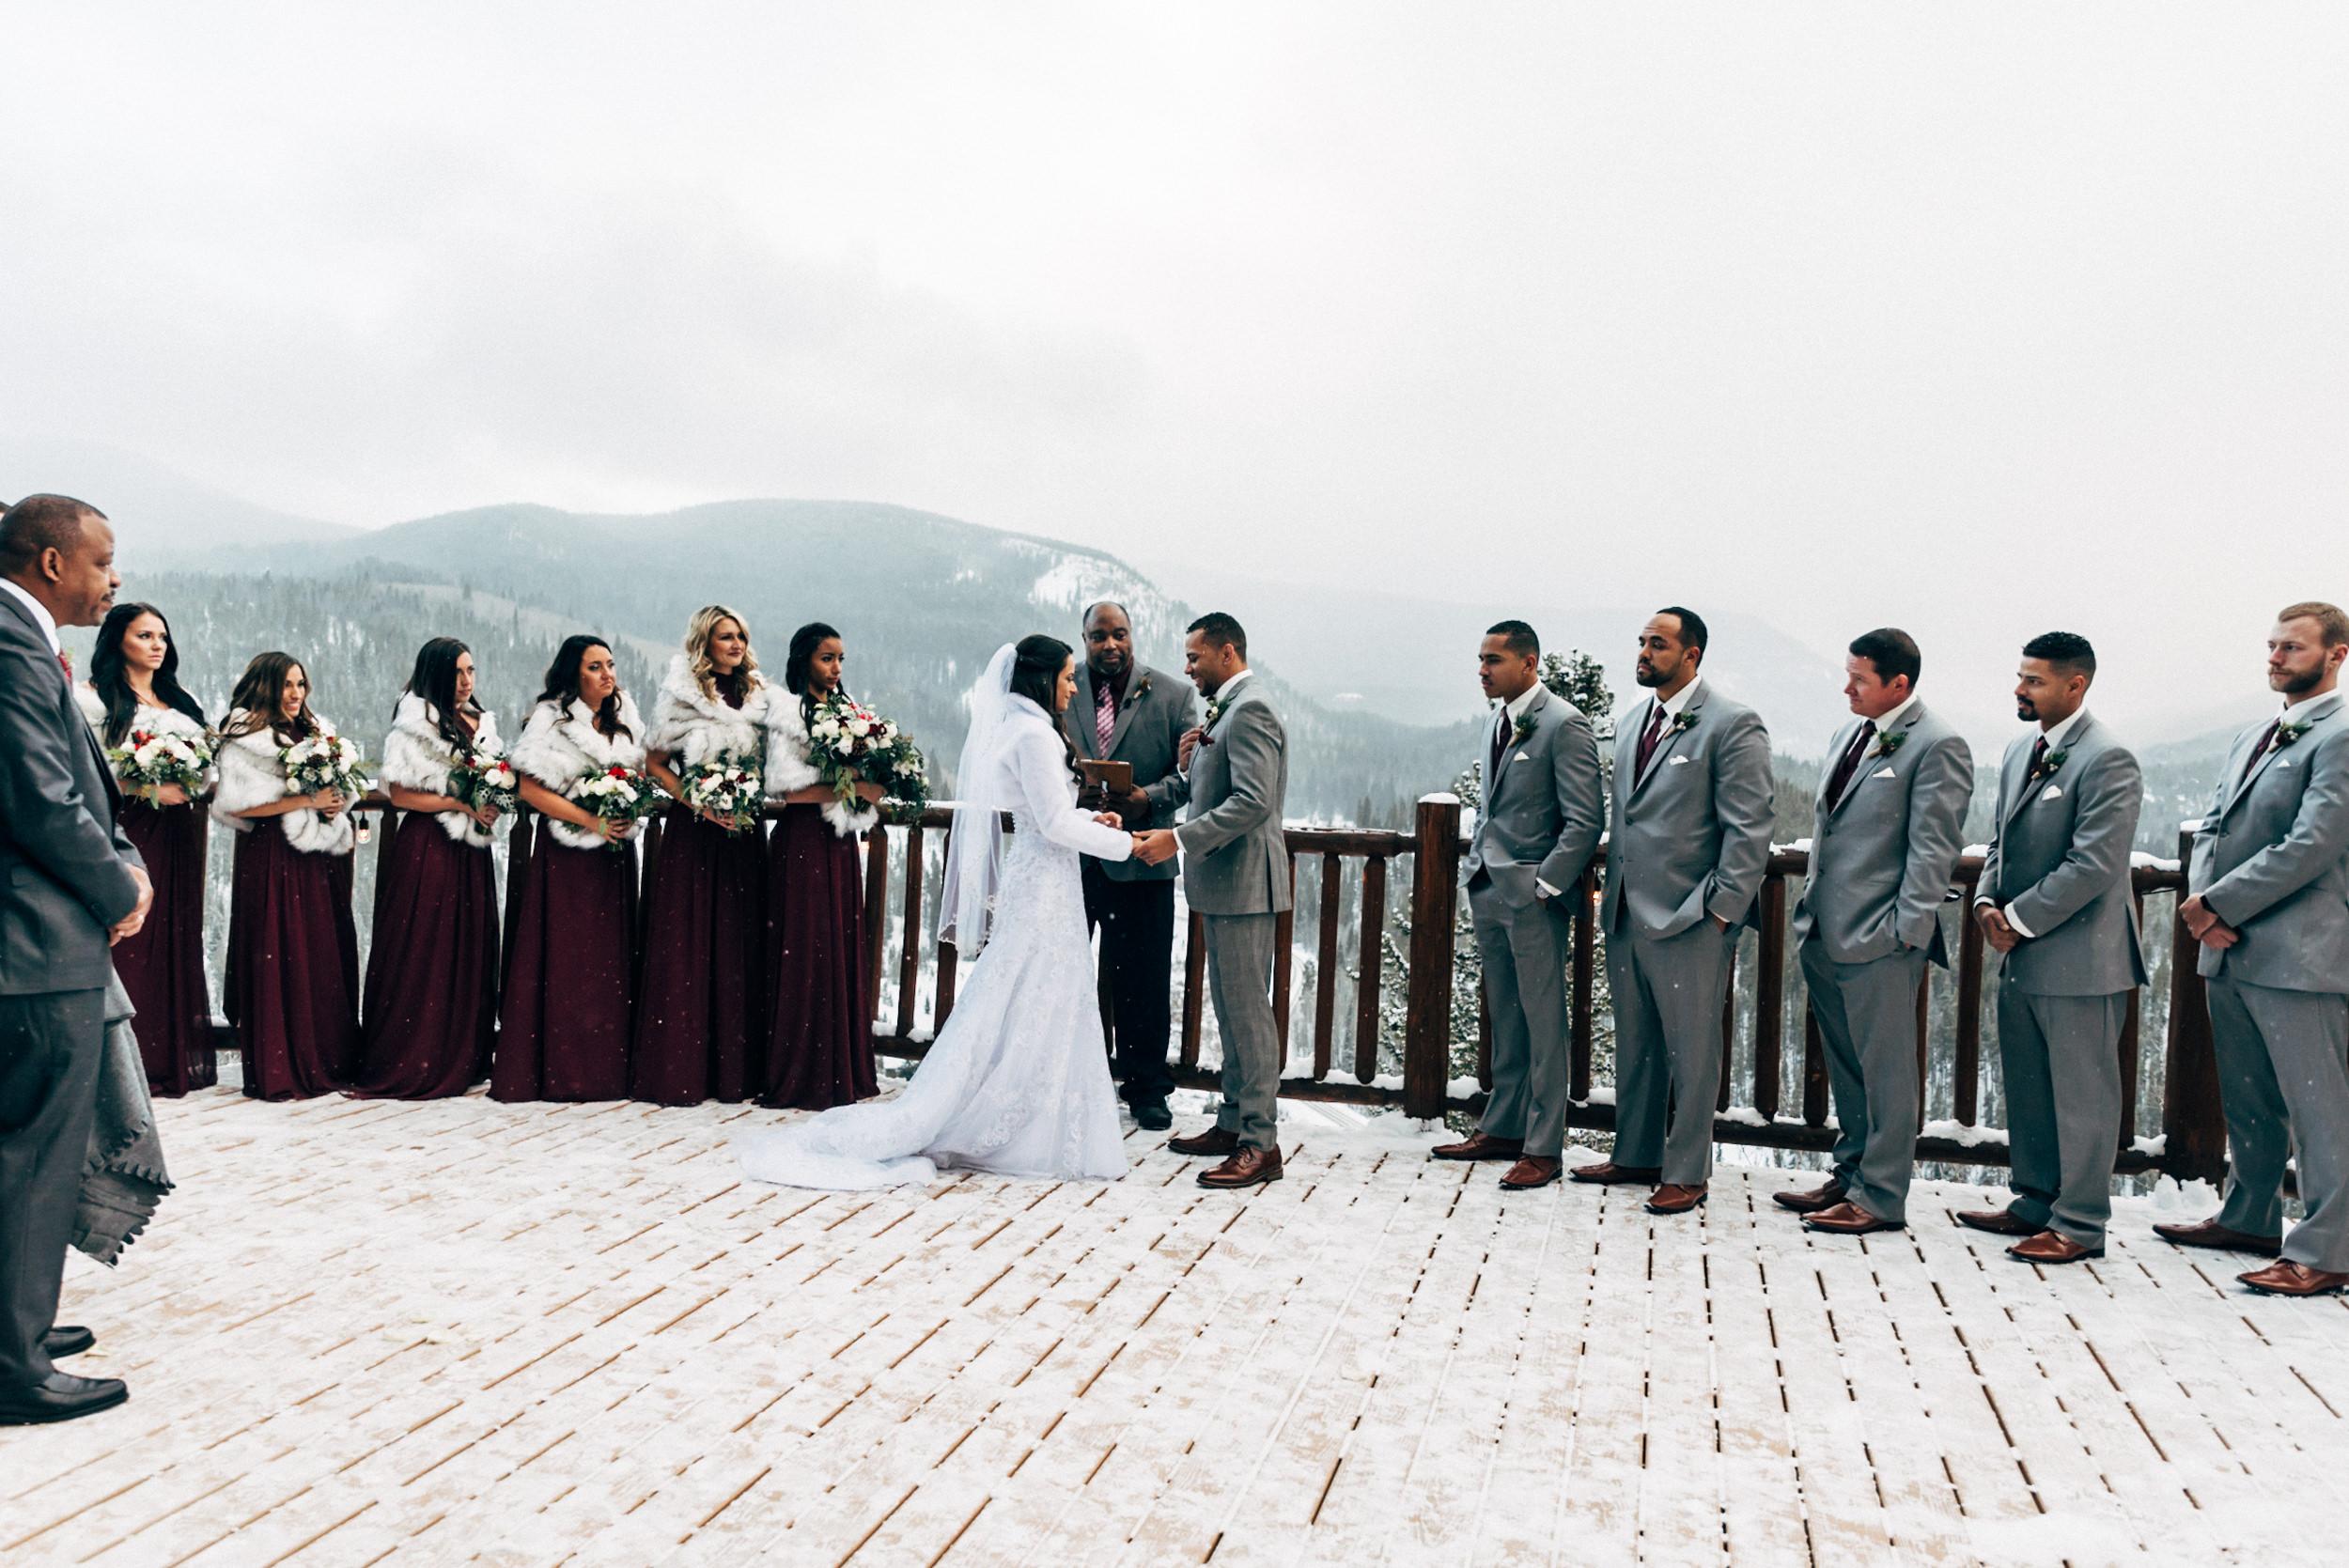 Colorado-Wedding-Photographer-Breckinridge-Mountain-Adventure-Elopement-57.jpg